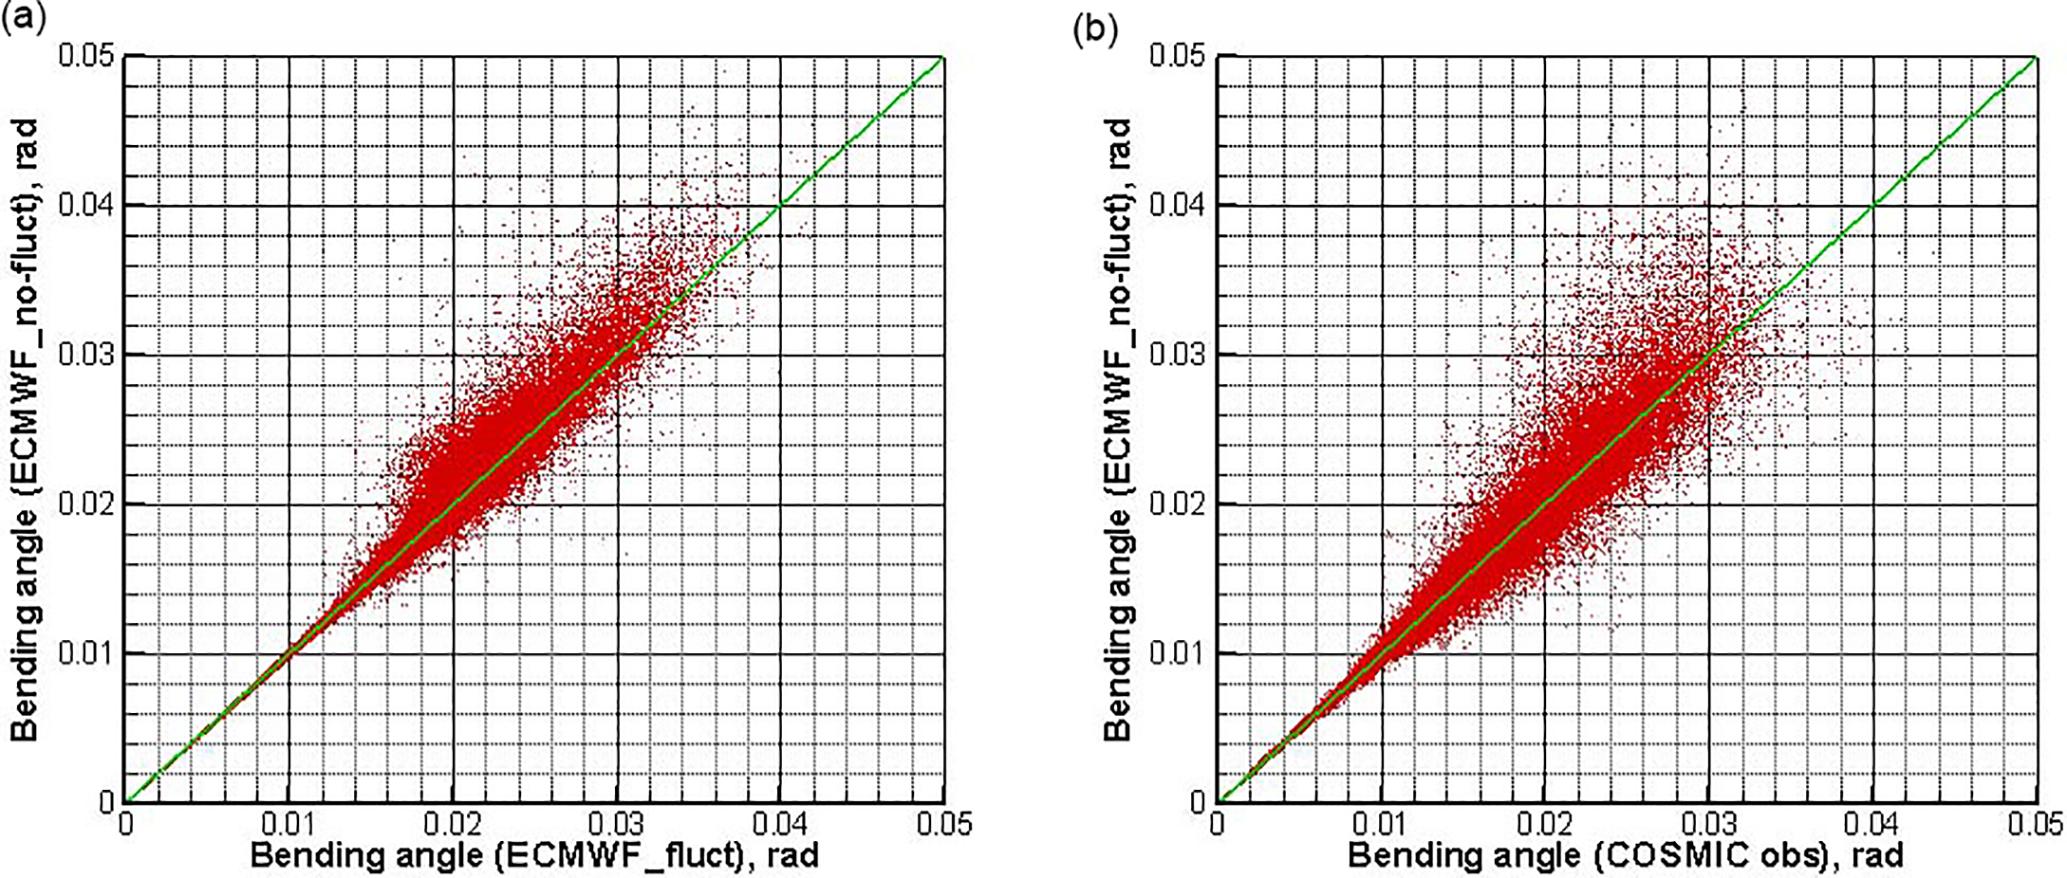 AMT - Wave-optics uncertainty propagation and regression